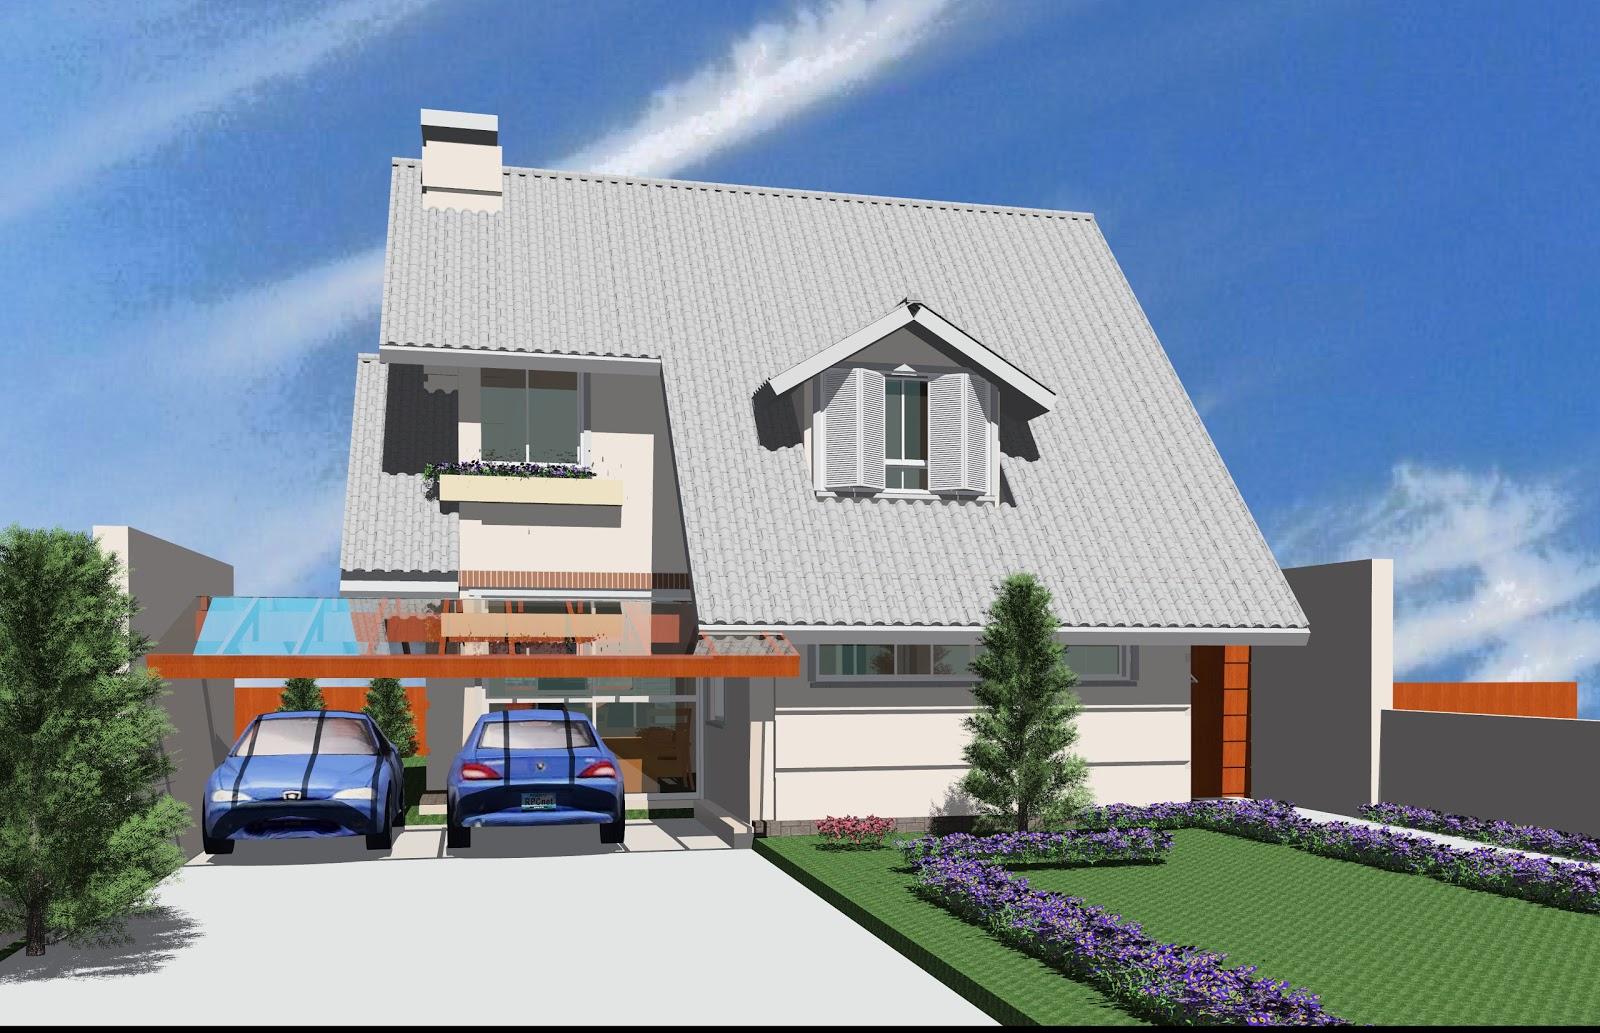 Casa frente modelo imoveis cultura mix muro casas modernas for Modelos de casas modernas